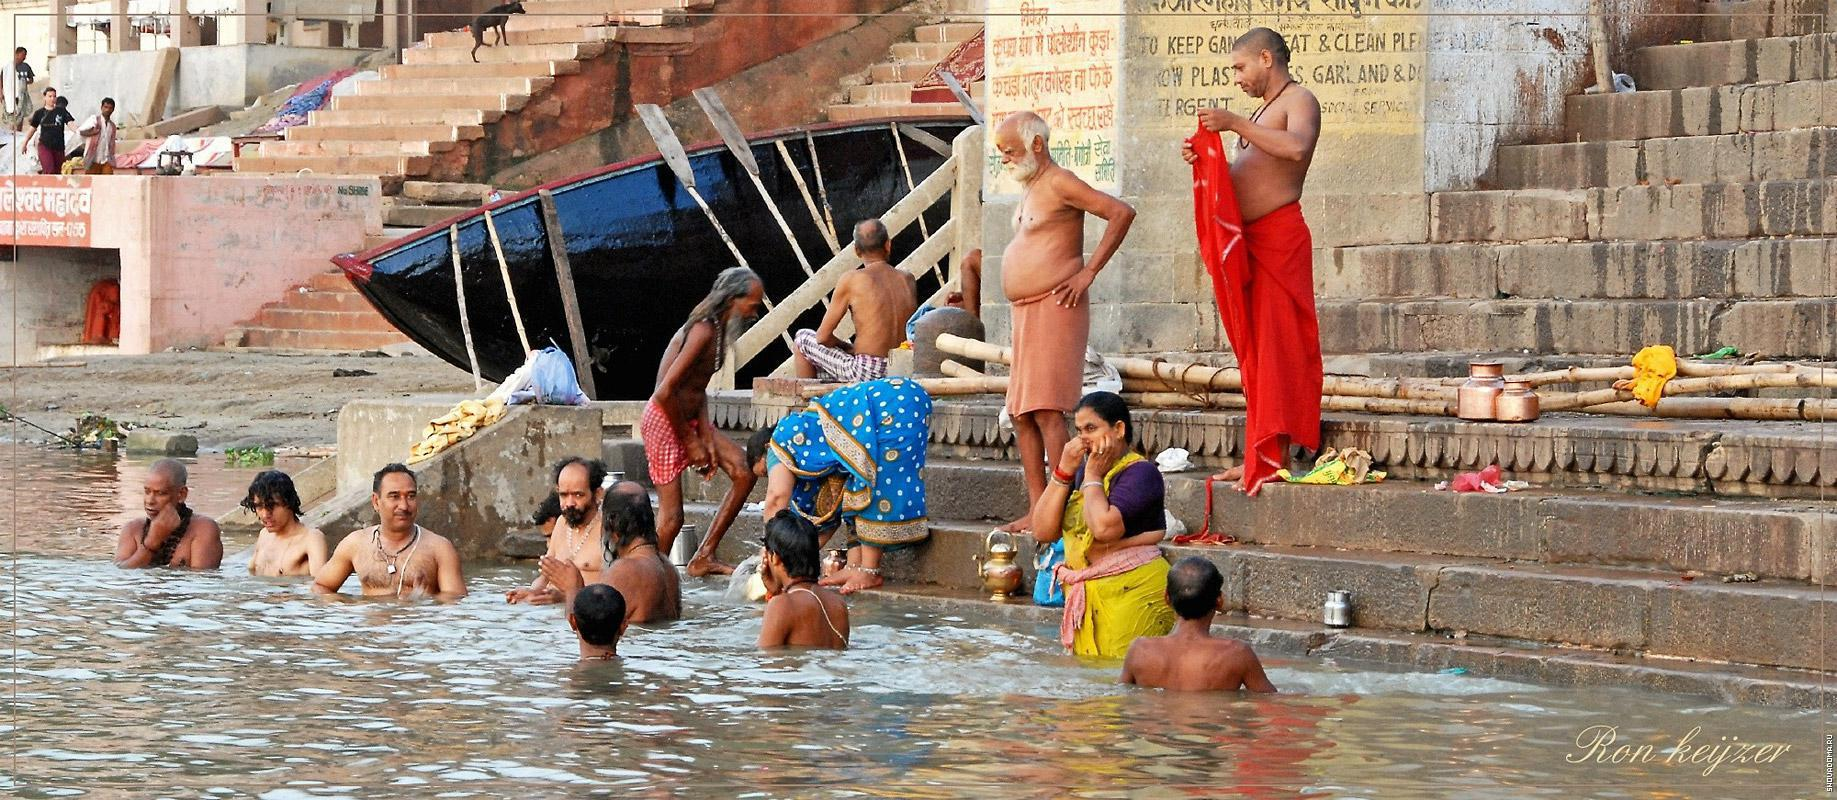 Ganges-photo05.jpg